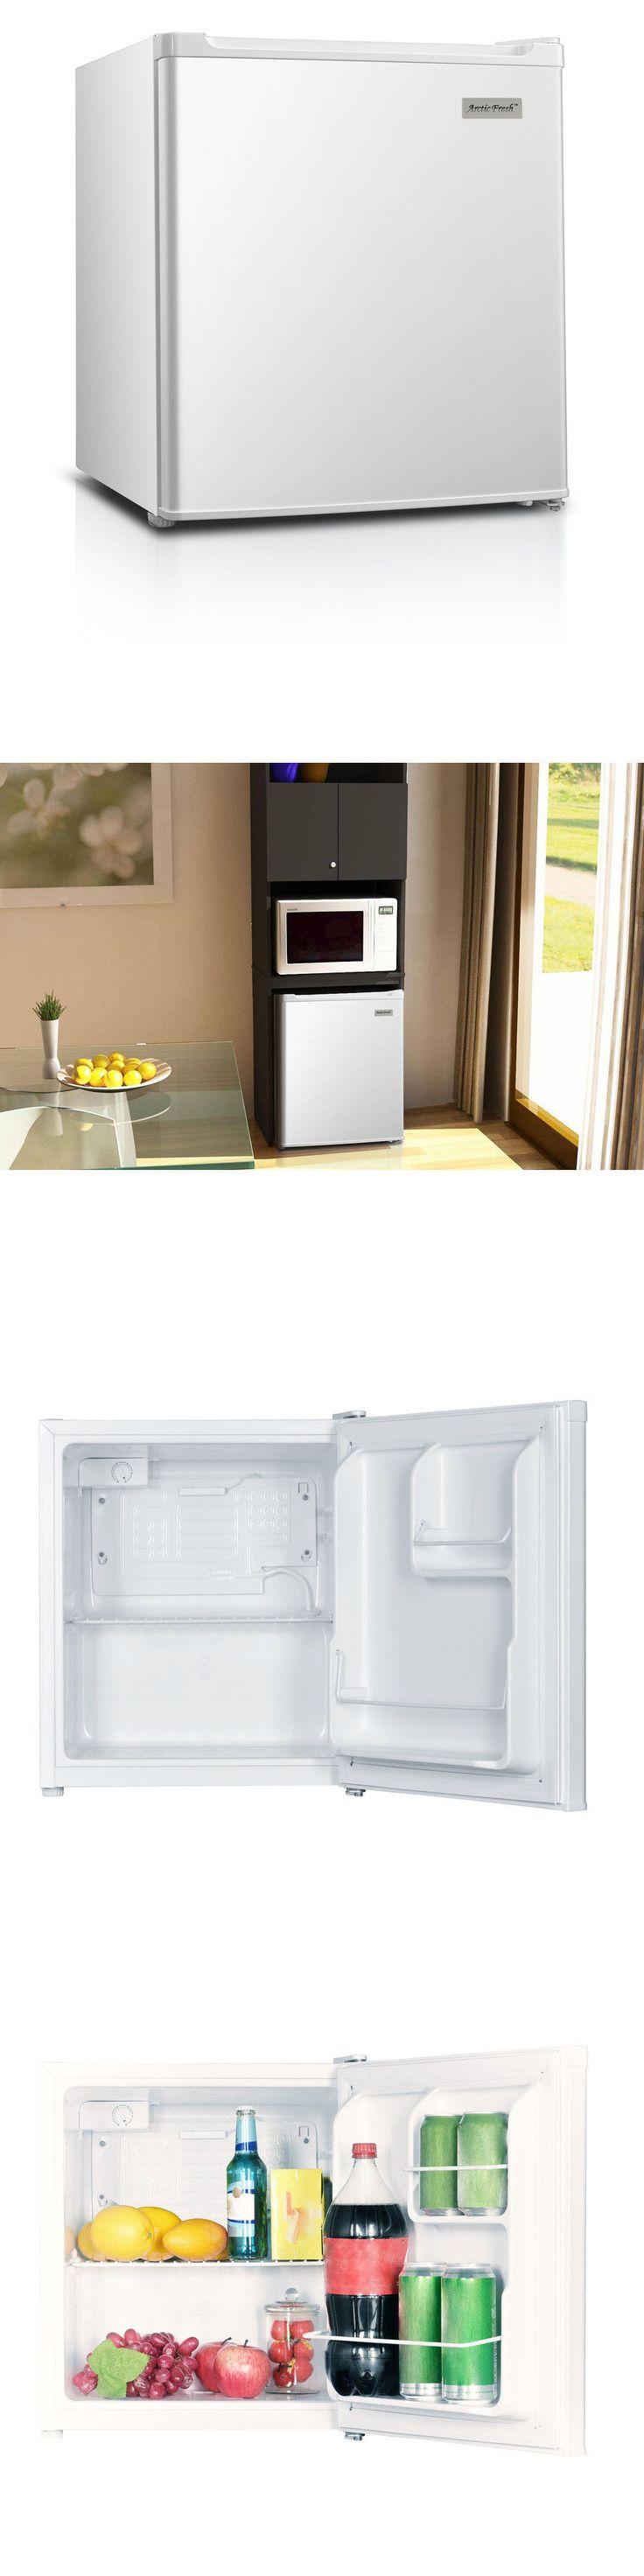 Mini Fridges 71262: White 1.6 Cu Ft Mini Fridge - Compact Refrigerator For College Dorm Or Office -> BUY IT NOW ONLY: $64.99 on eBay!